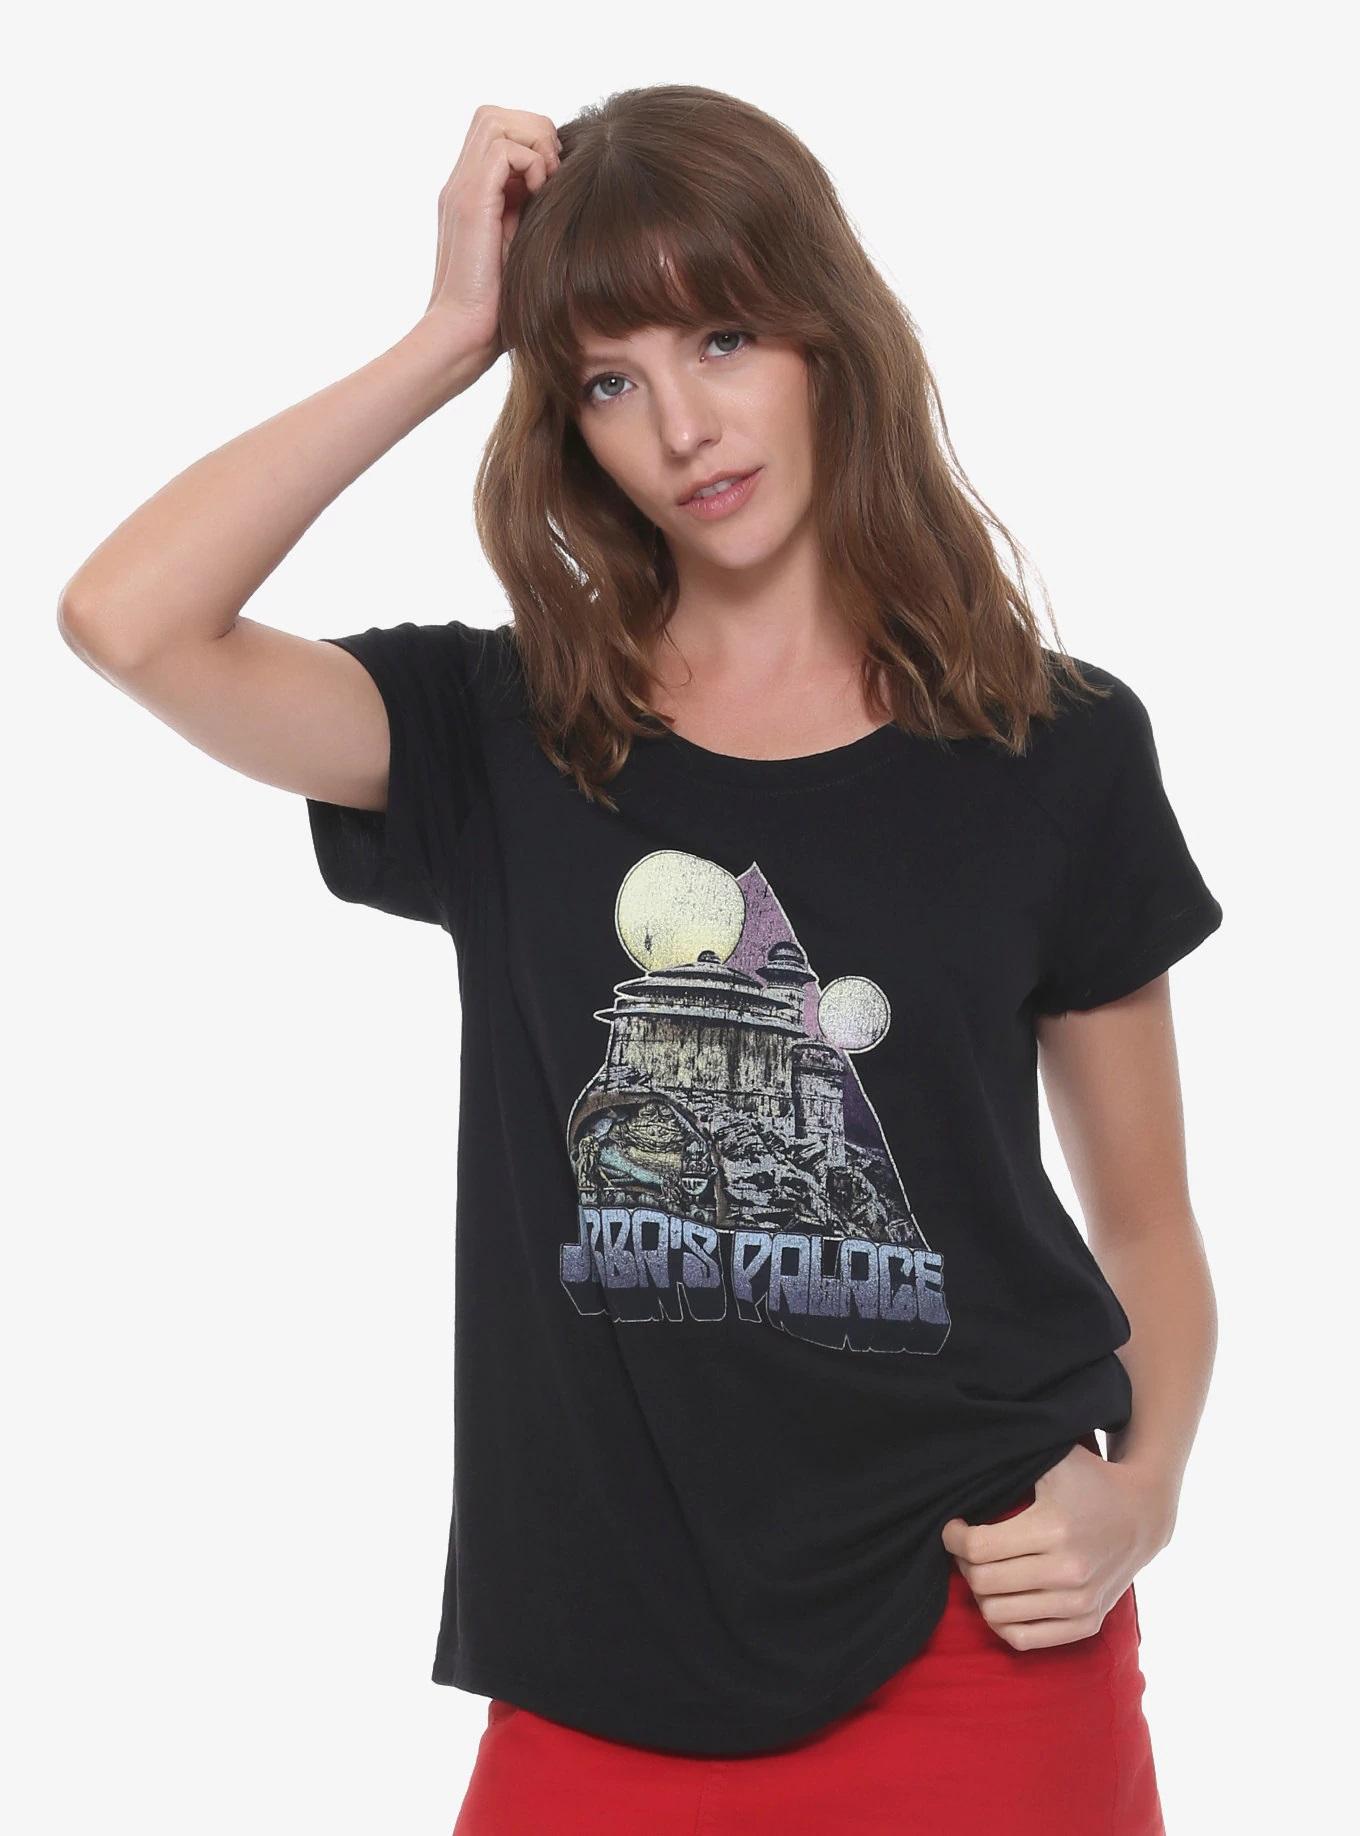 Women's Star Wars Jabba's Palace T-Shirt at Box Lunch